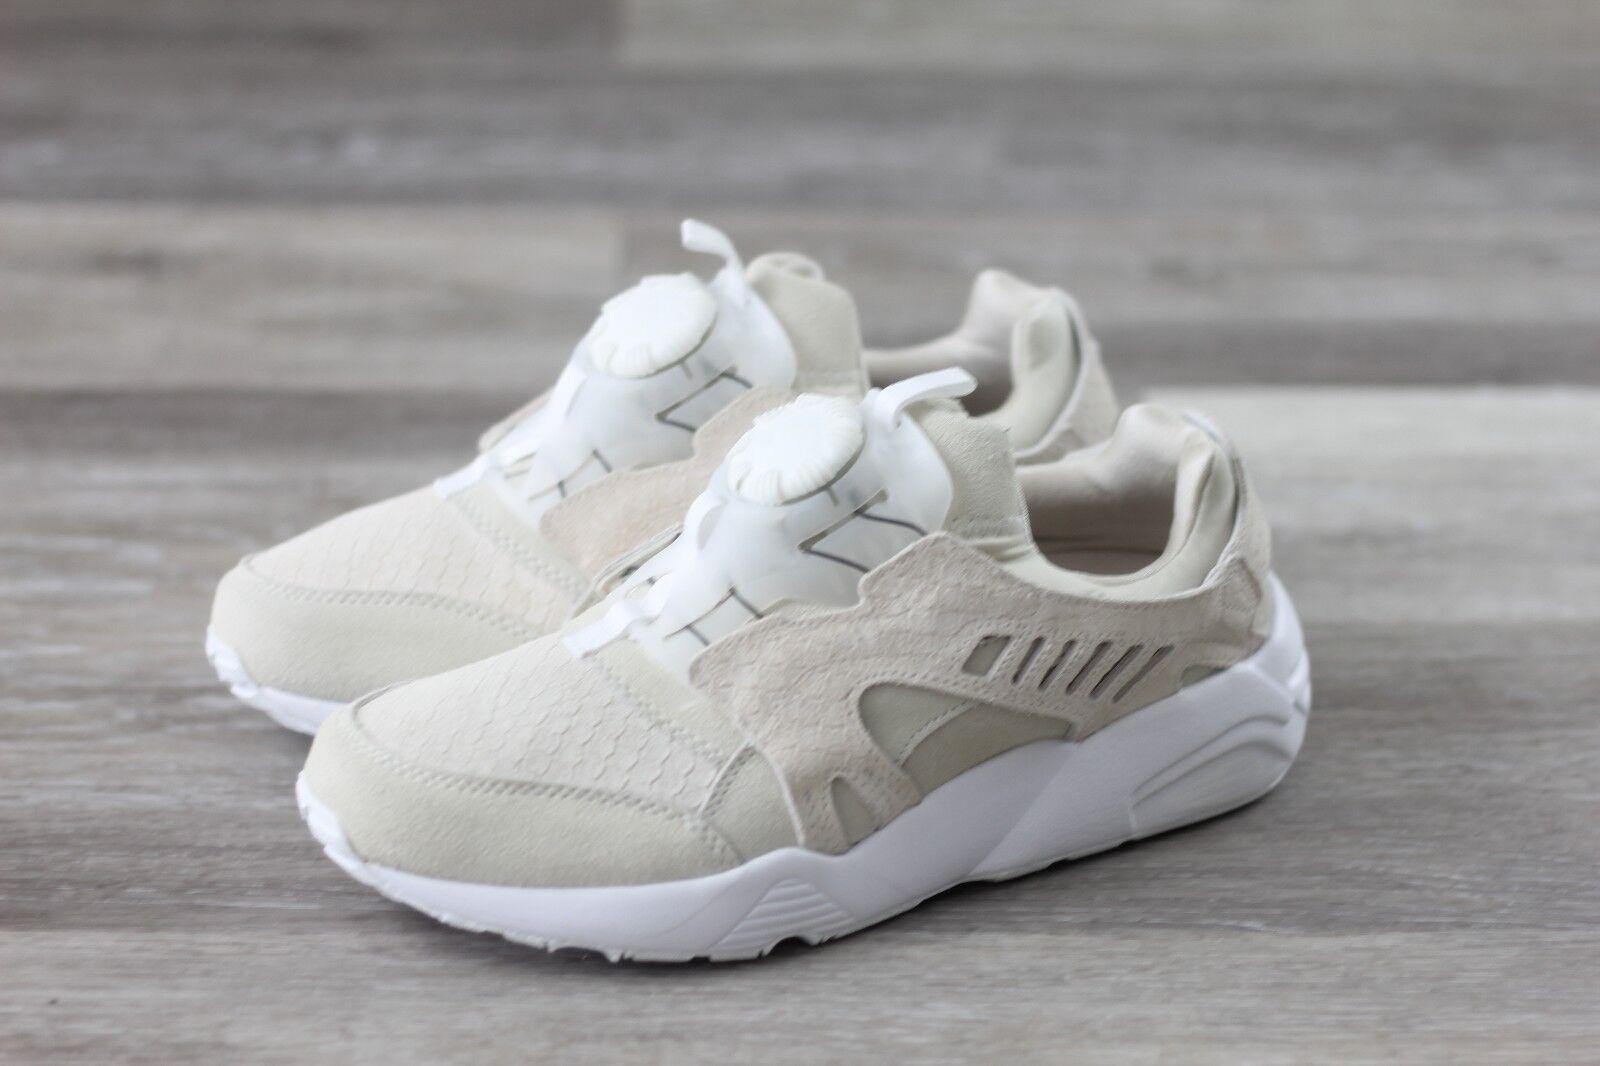 Puma - Women's Disc Blaze Nude - Grey / White- 361914 01 - Shoes sneakers